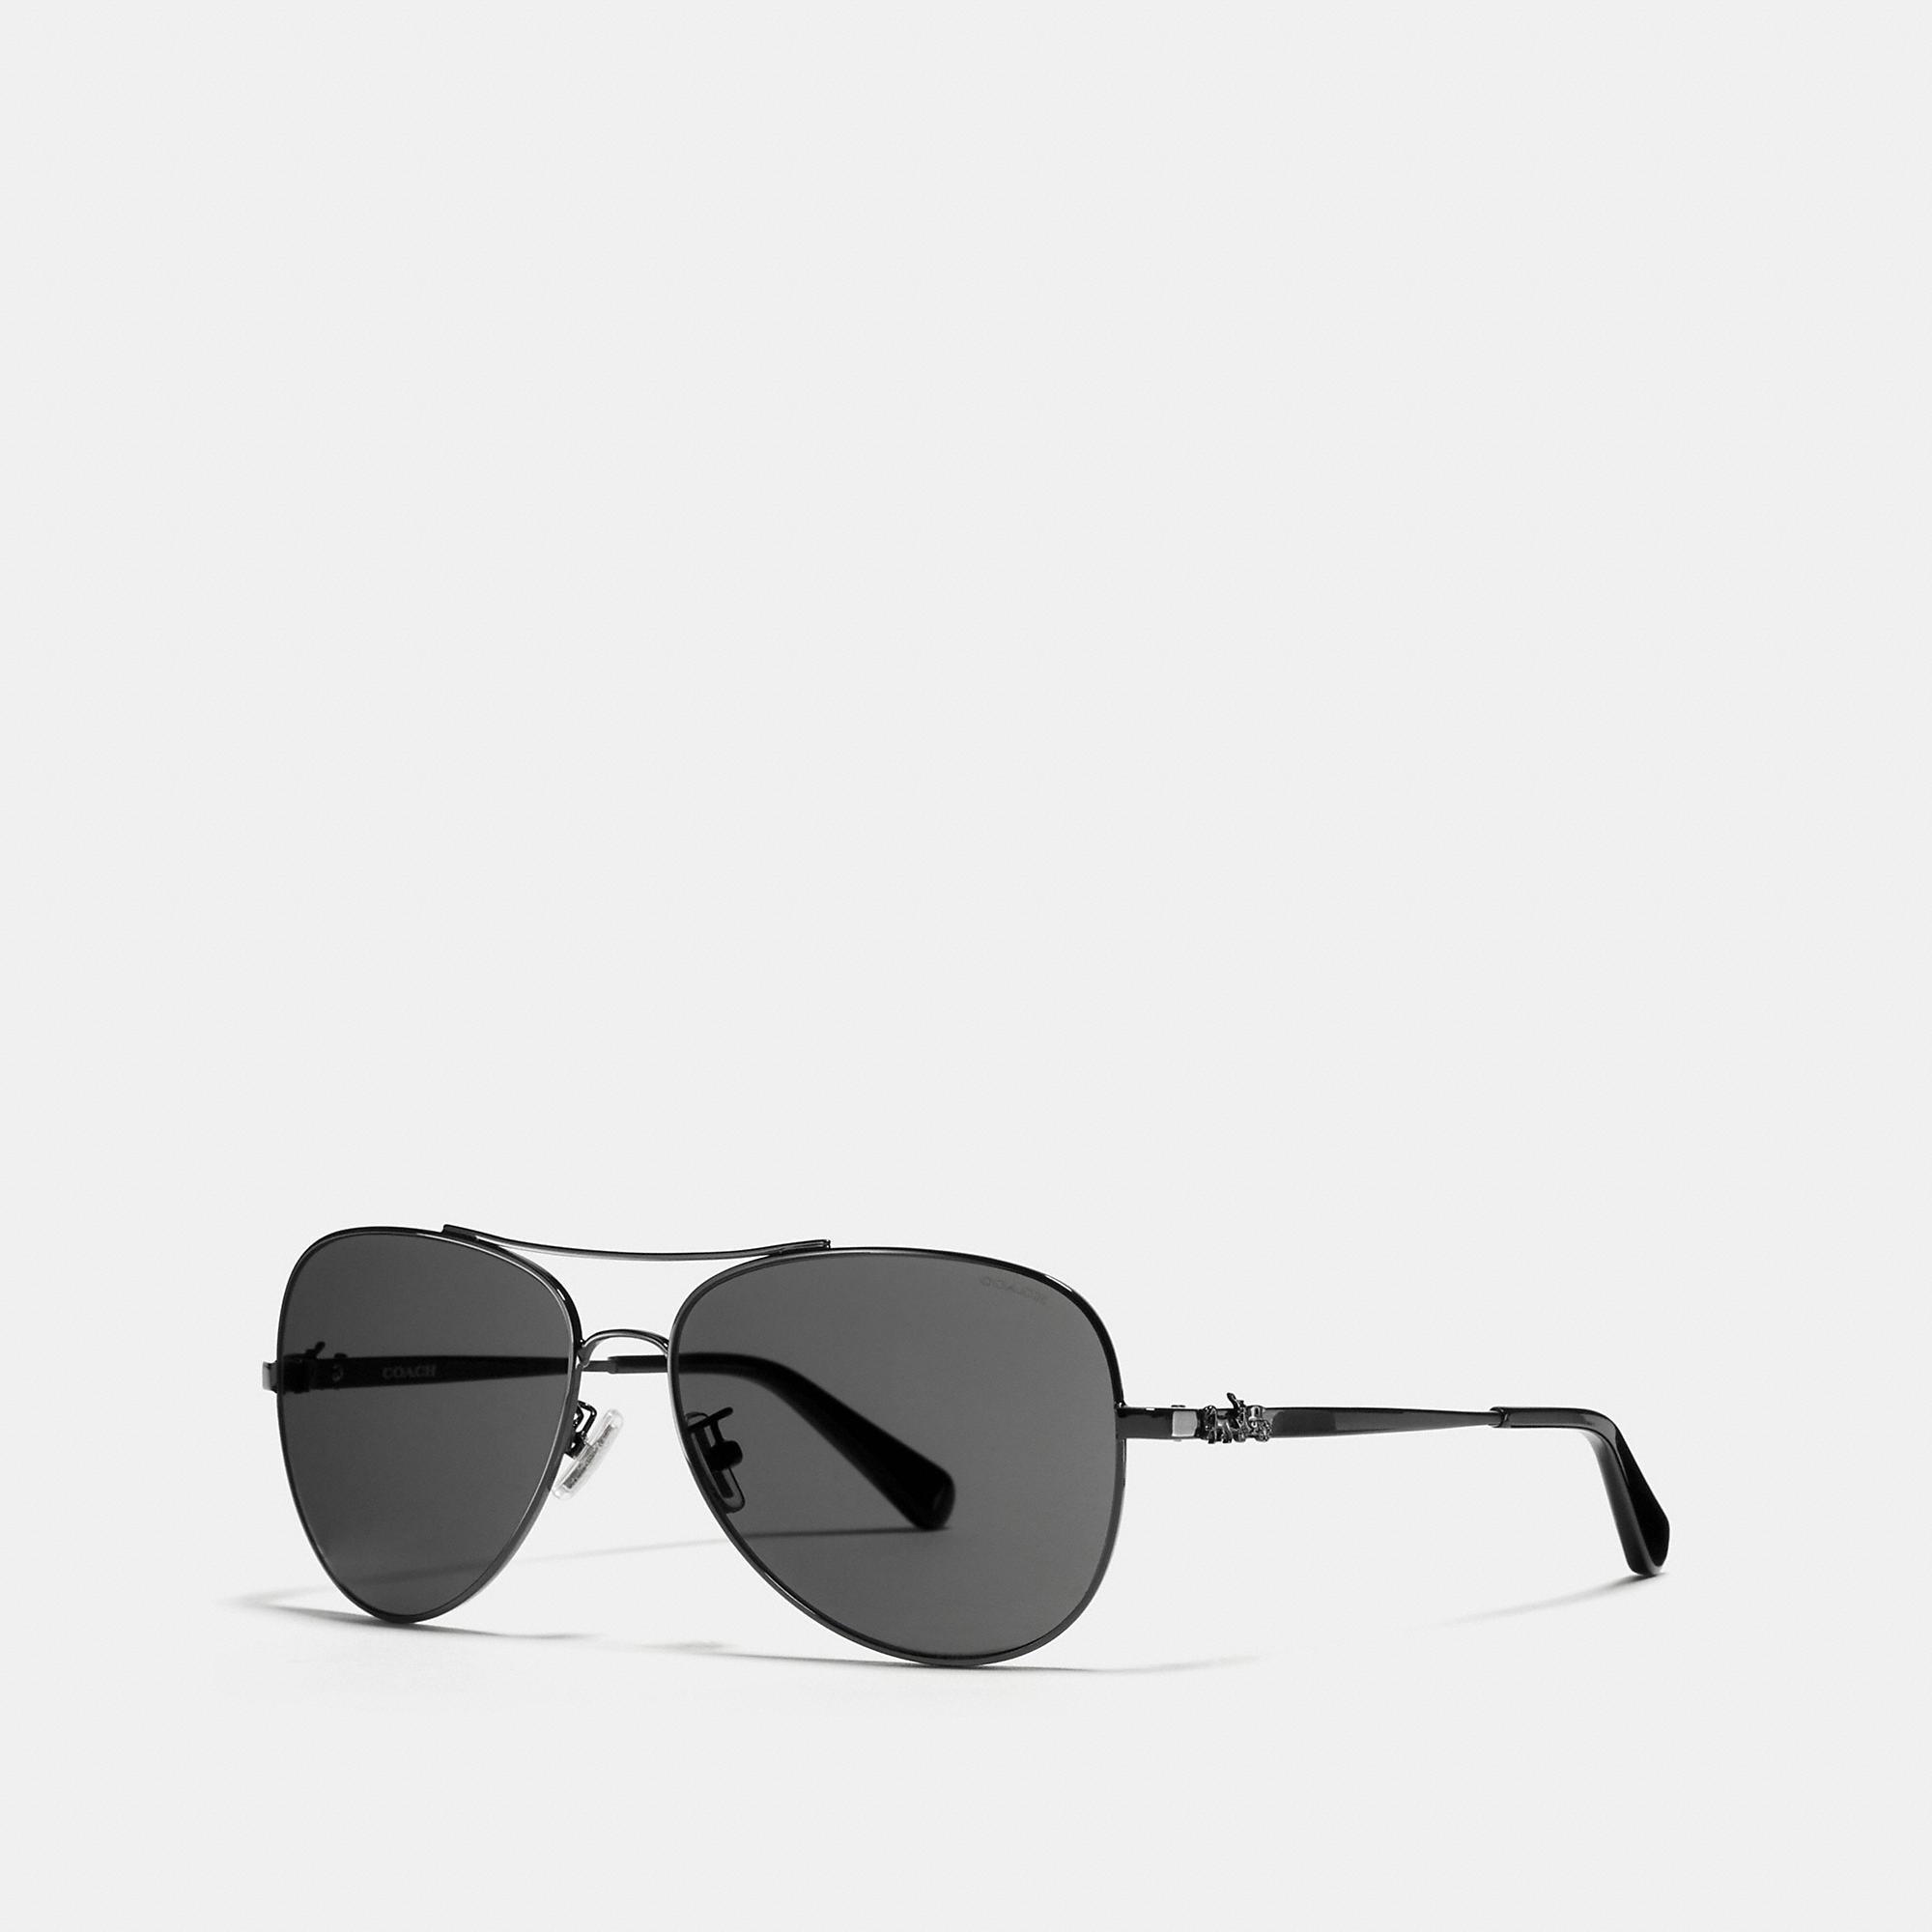 07a017b4bd4b5 Coach Horse And Carriage Metal Pilot Sunglasses - Women s In ...